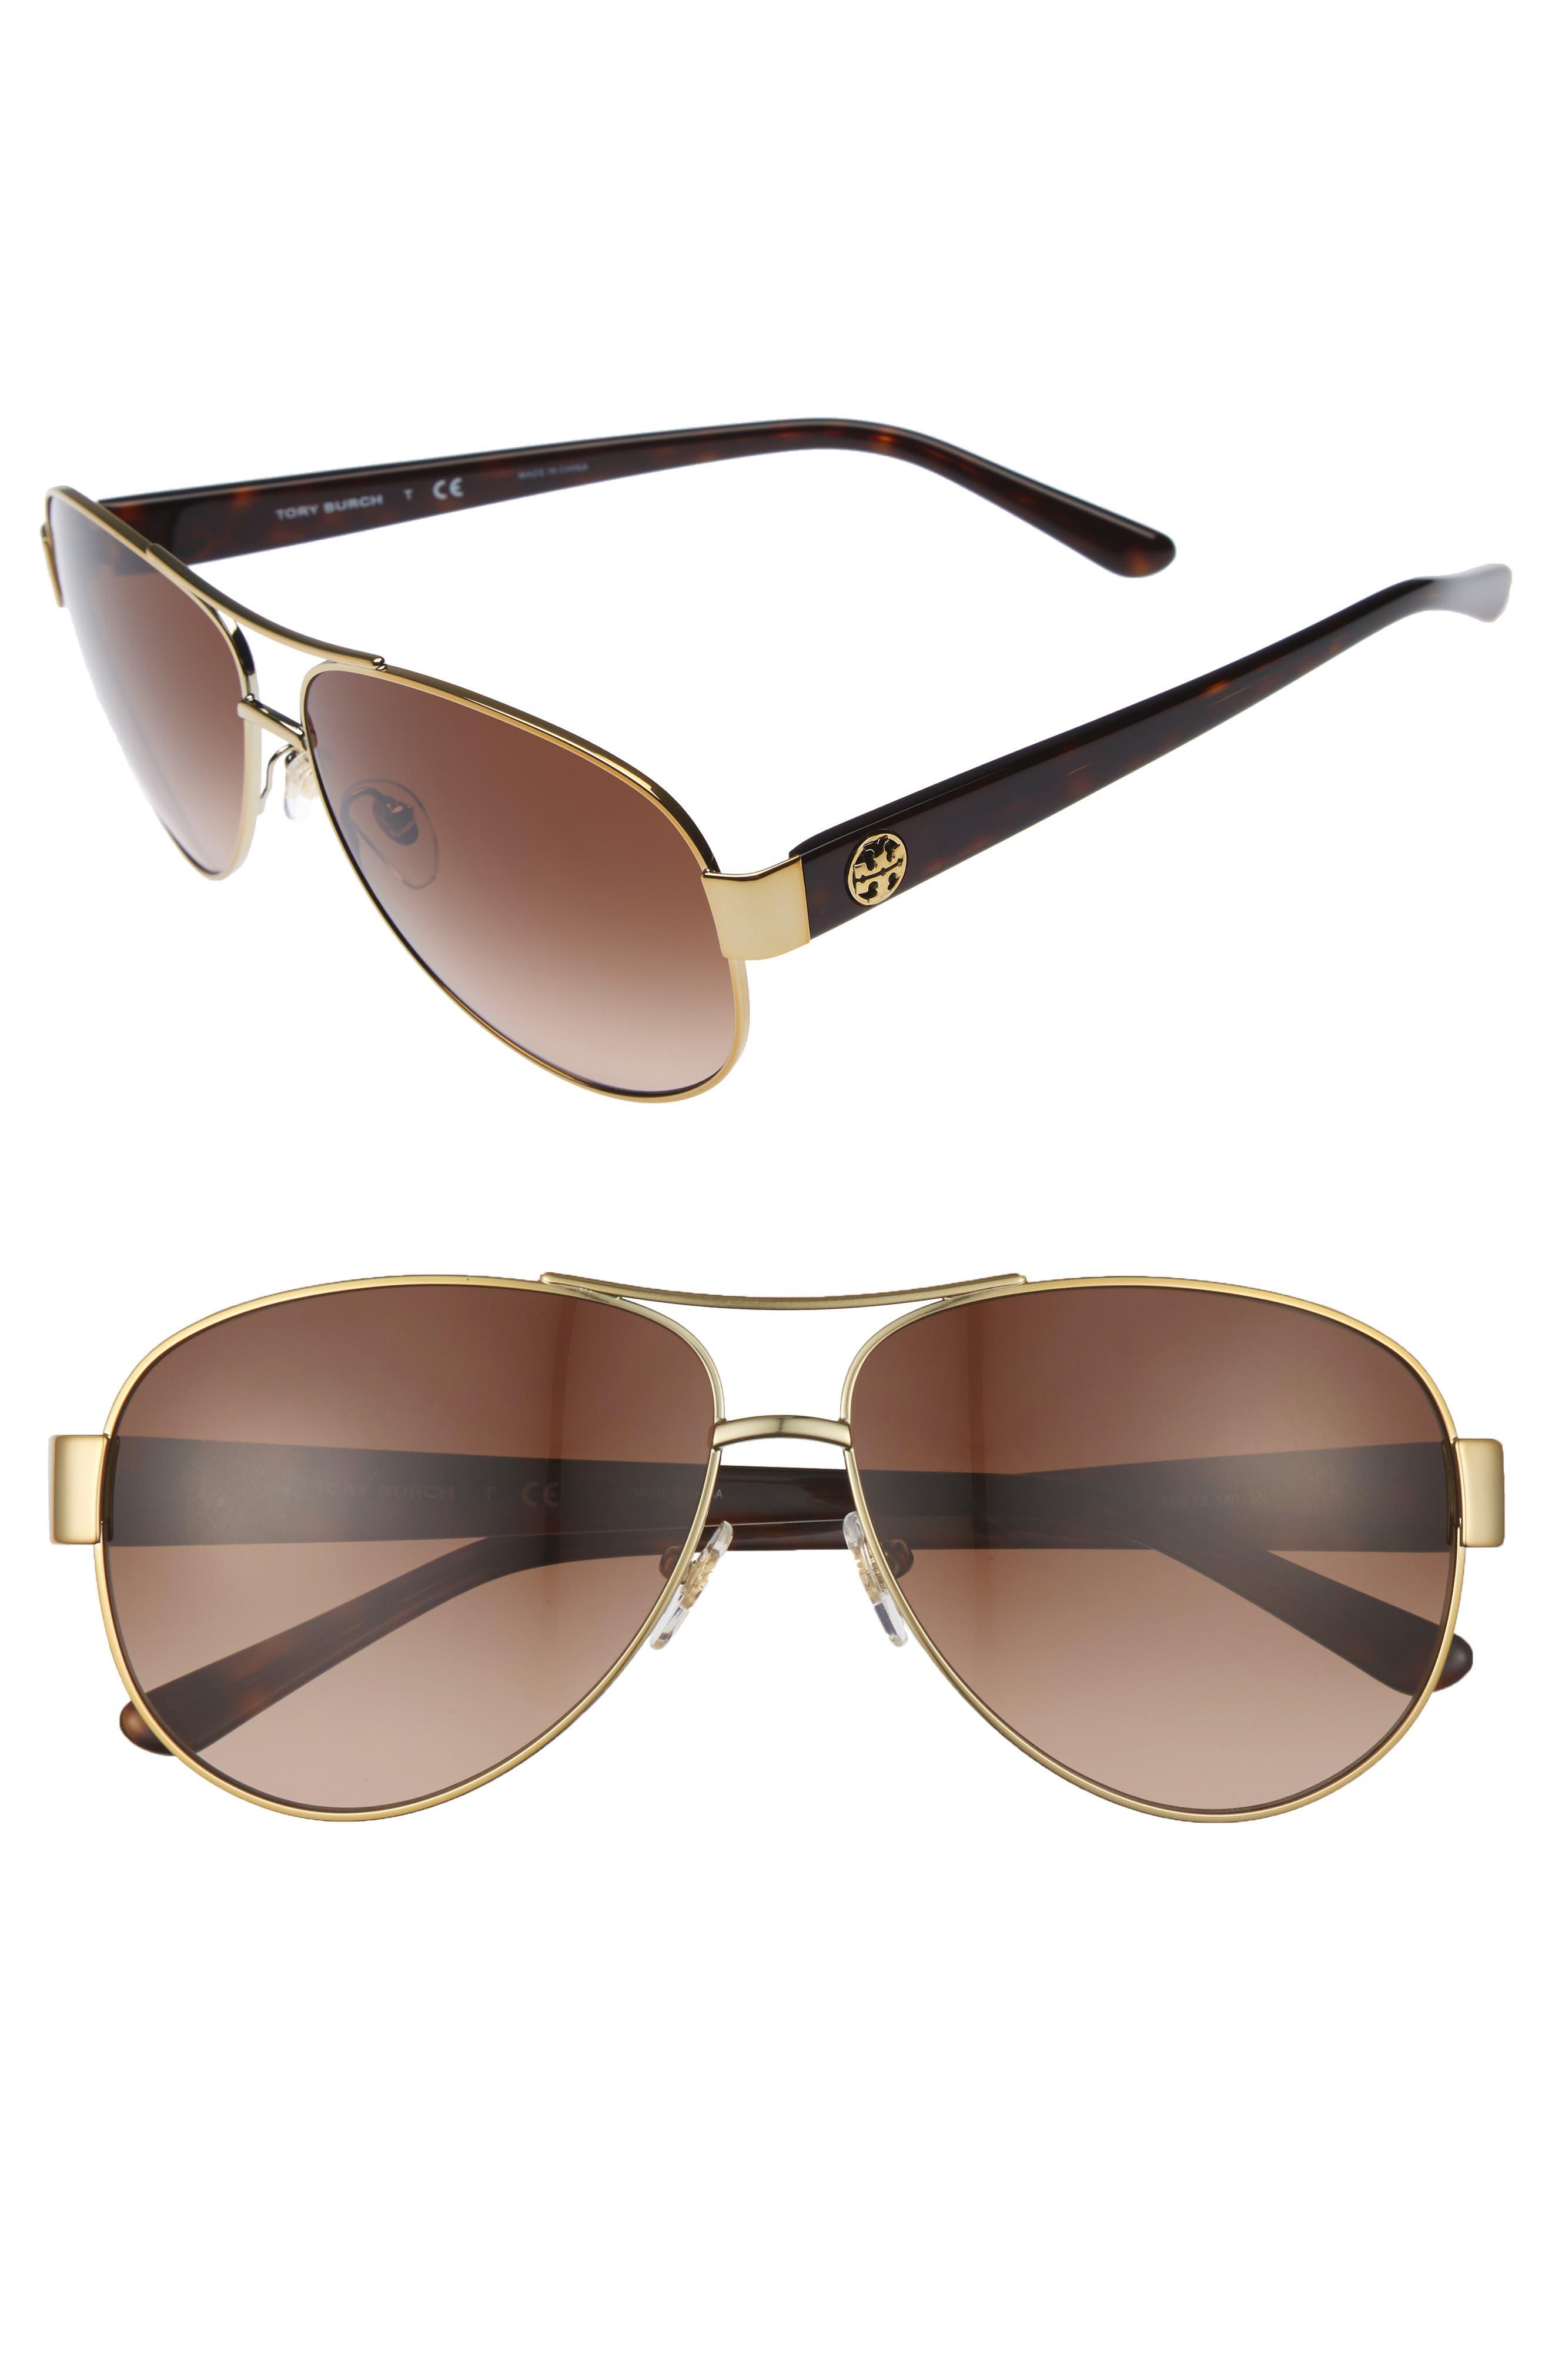 60mm Aviator Sunglasses,                         Main,                         color, Gold/ Brown